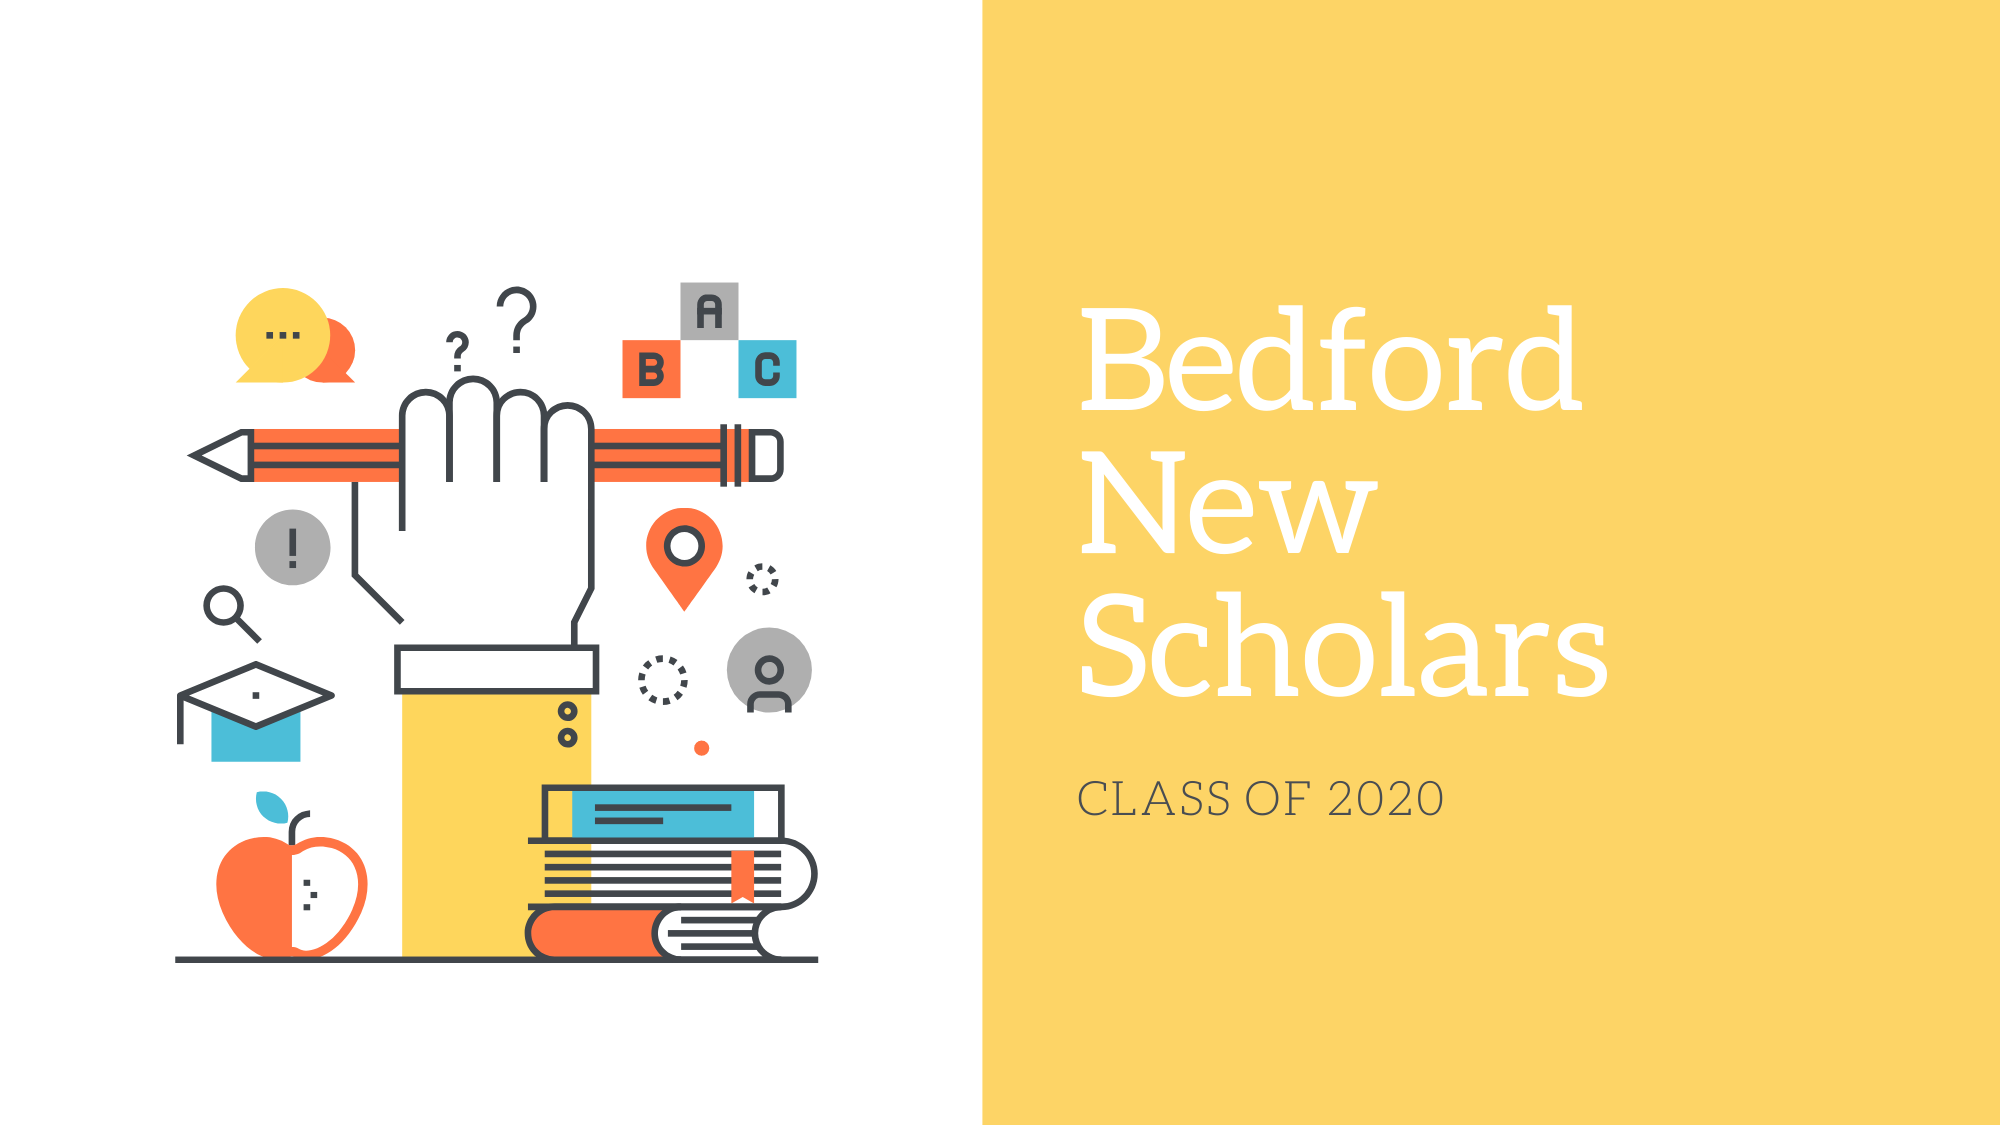 Bedford New Scholars Class of 2020